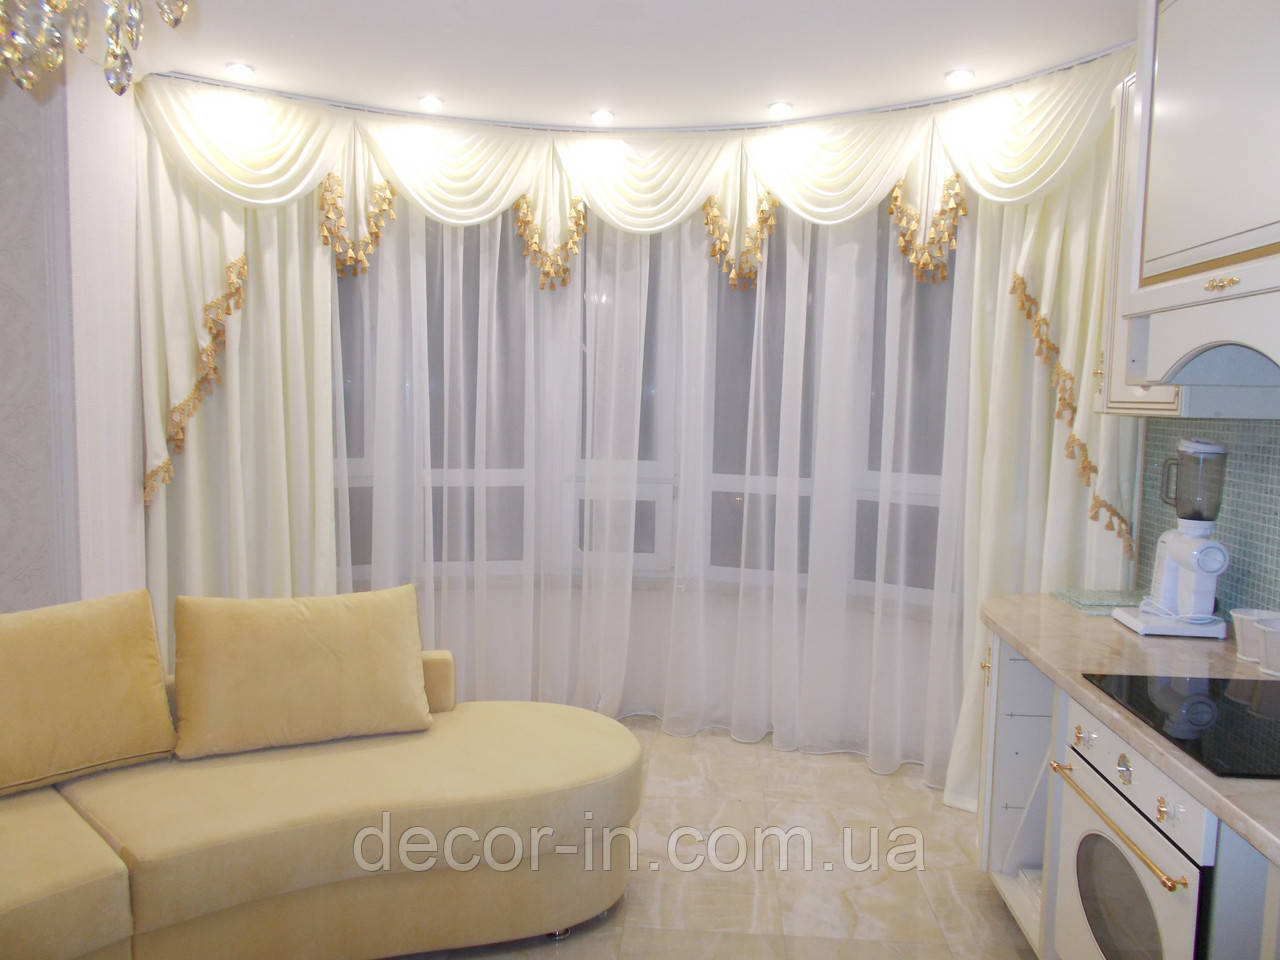 Комплект штор, ламбрекен и тюль на 4-4,5 м - Decor-In в Киеве